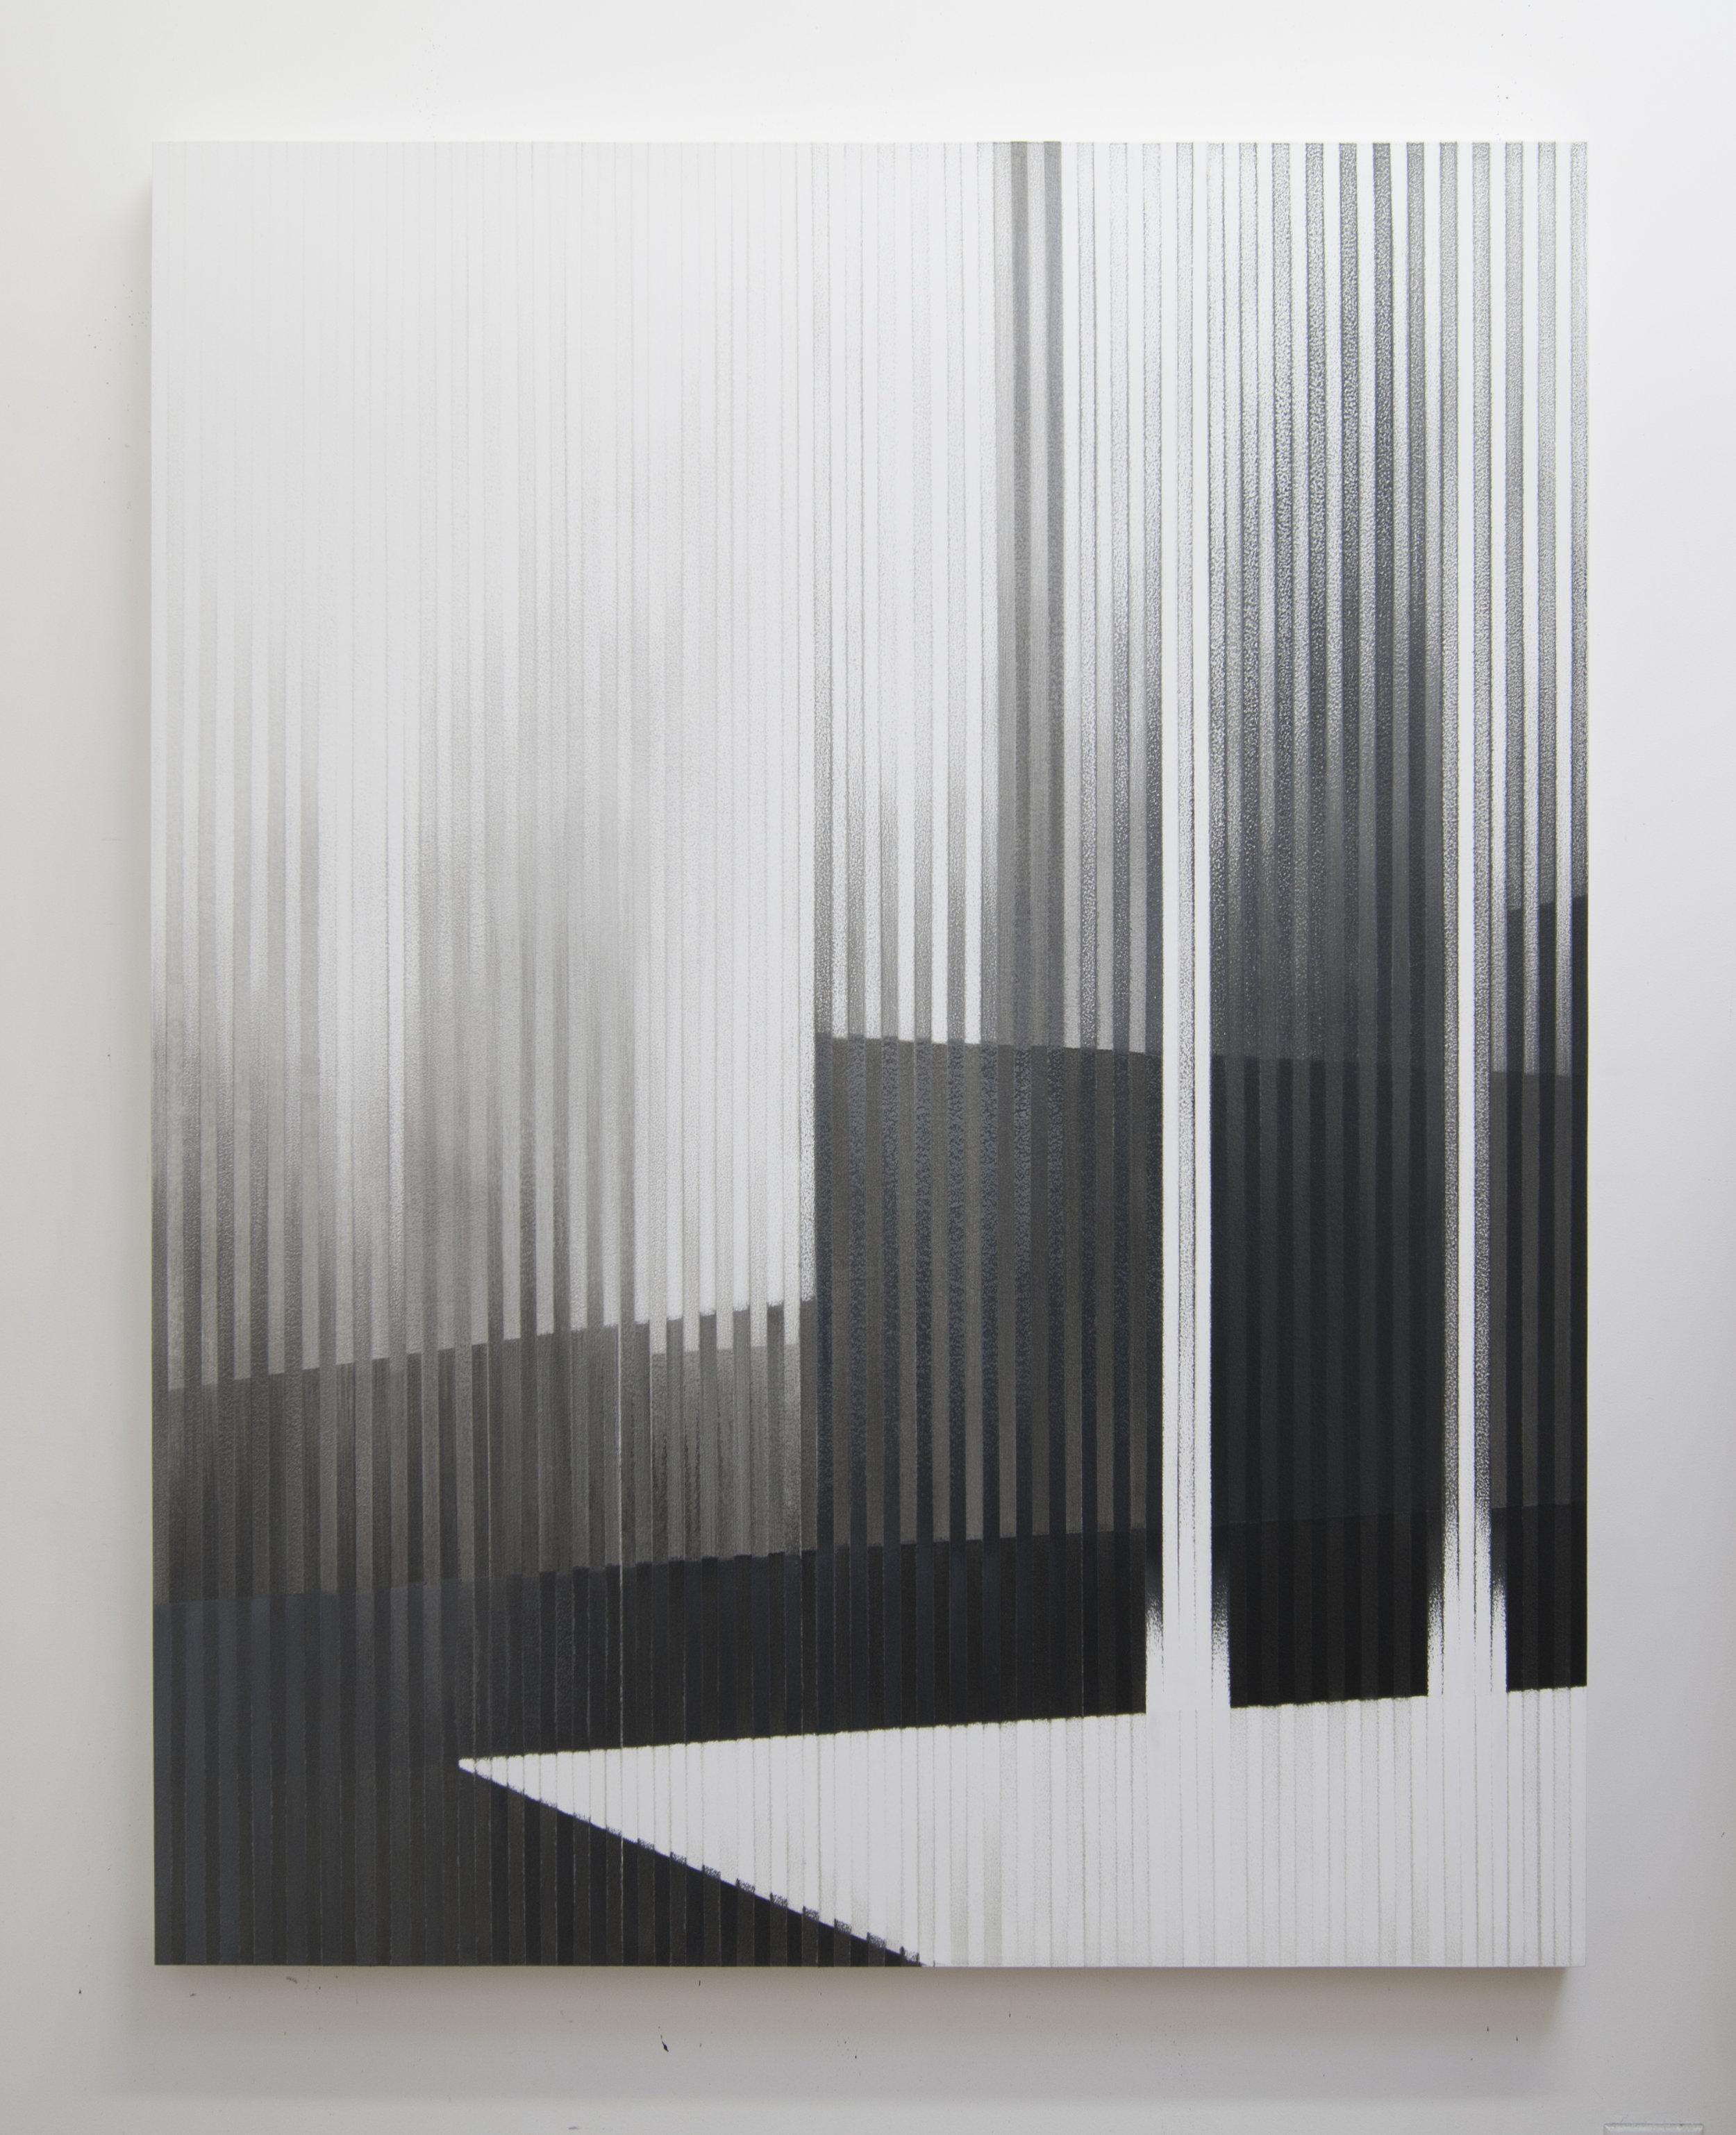 Savage Arms III, 2014  Acrylic on panel, 56 x 44 inches